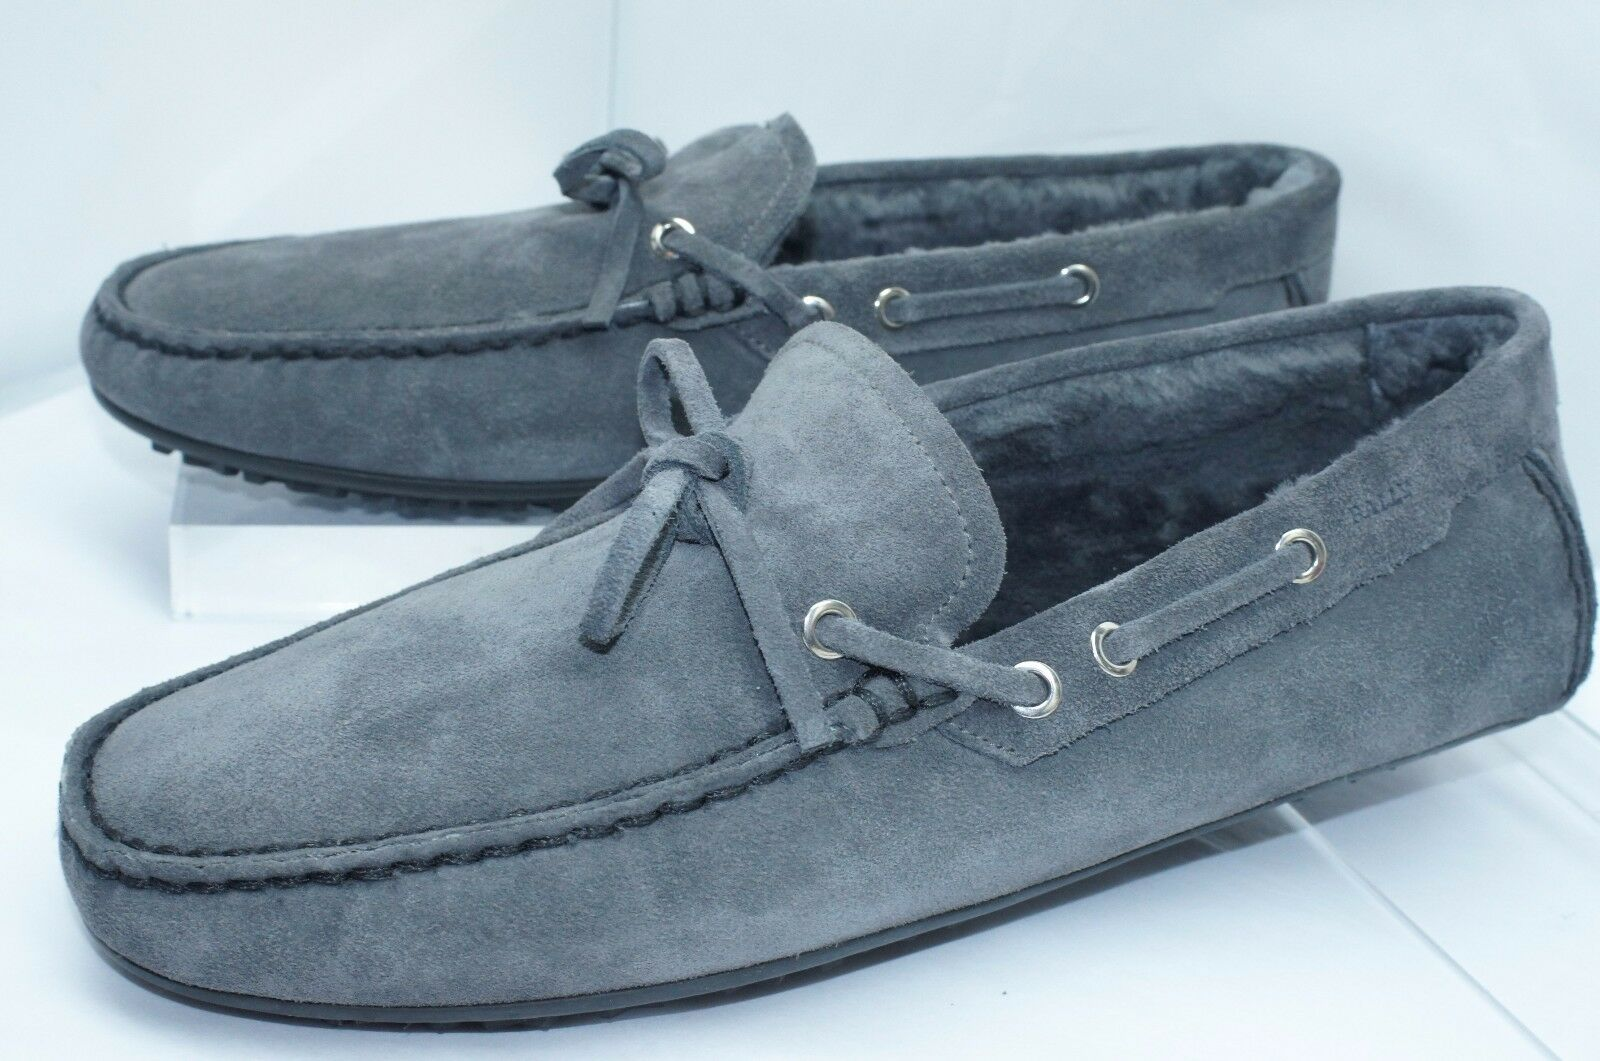 Scarpe casual da uomo  New Bally uomos Shoes Vedium Fur Loafers Size 10 Gray Drivers Suede